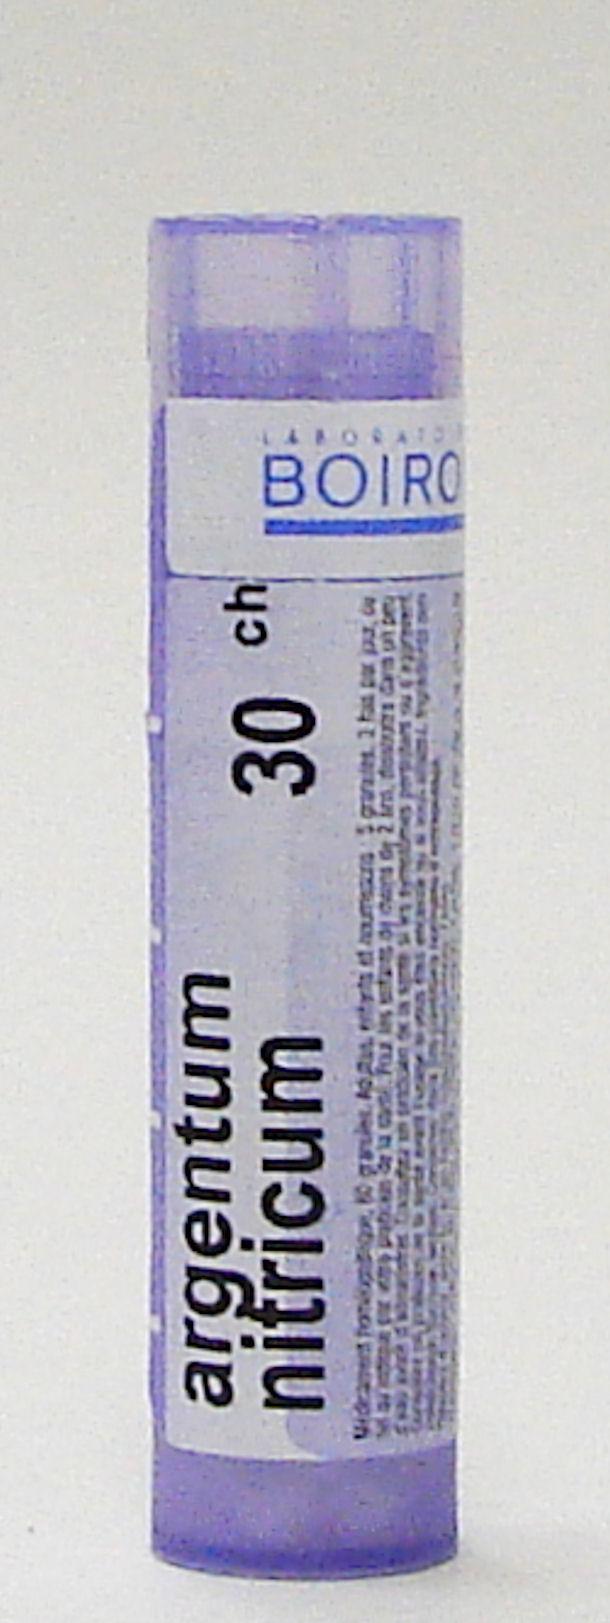 argentum nitricum 30 ch sublingual pellets (boiron)